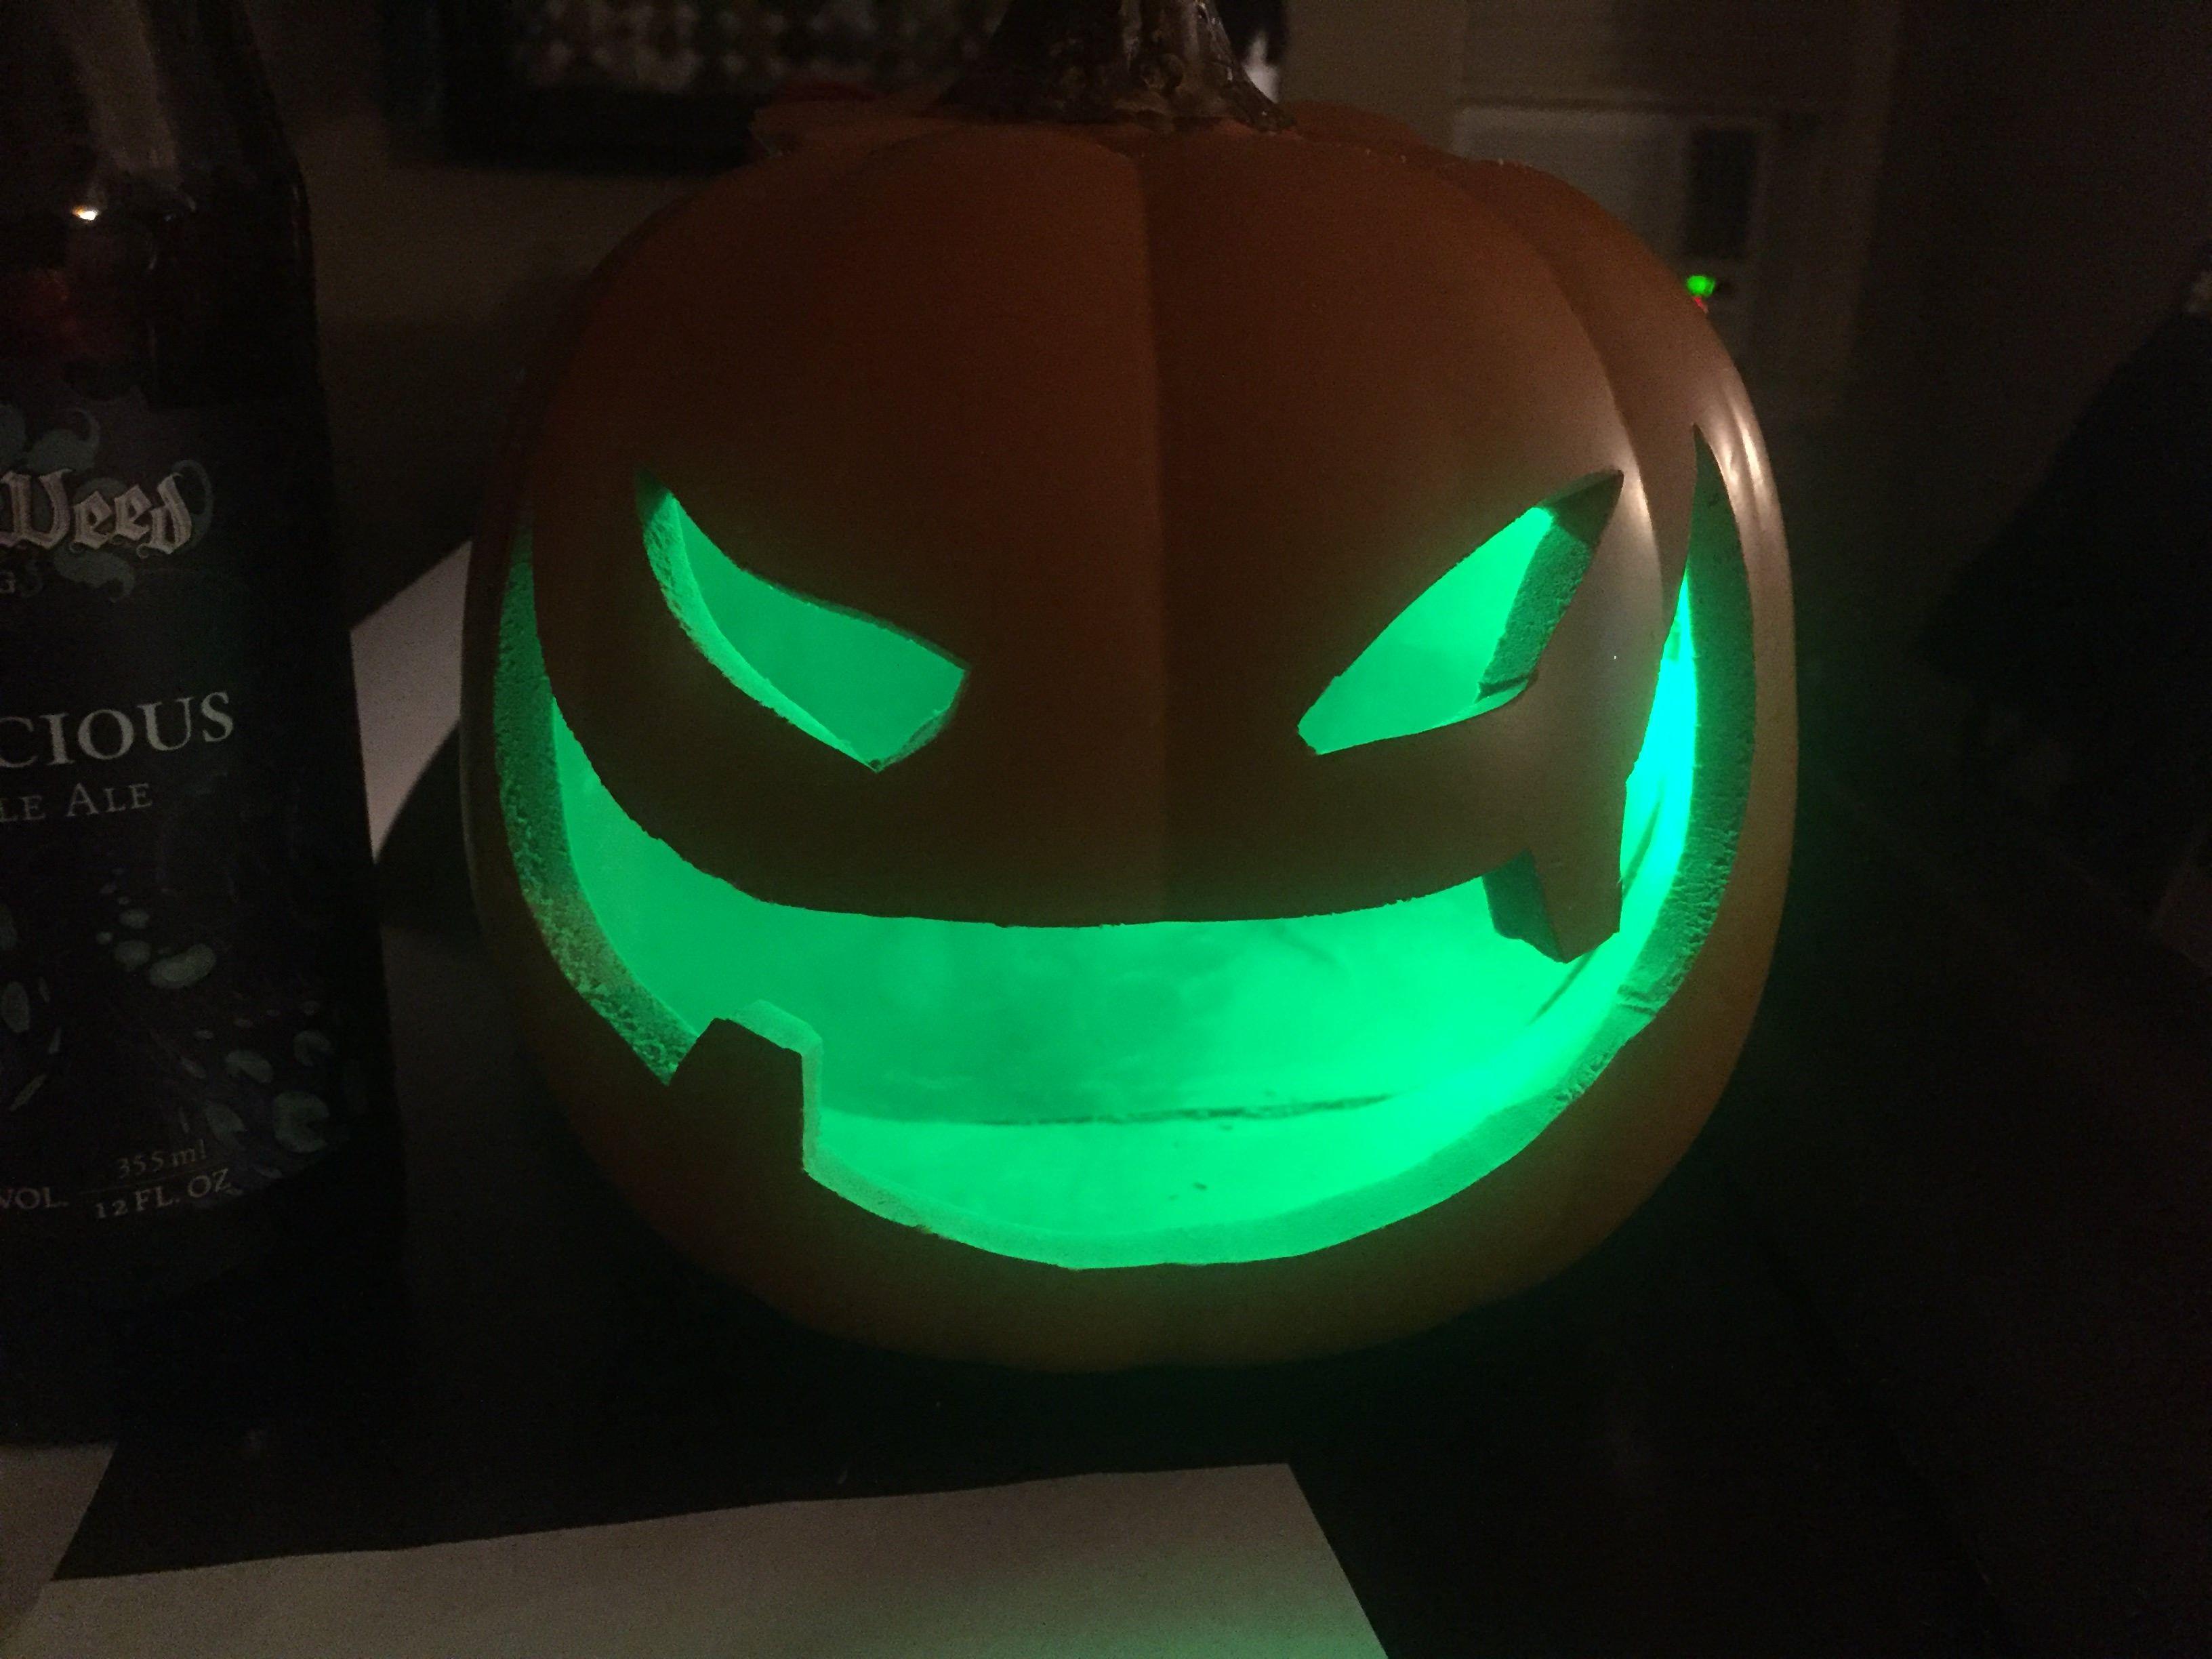 pumpkin template fortnite  Fortnite inspired craft pumpkin carving. in 6 | Pumpkin ...